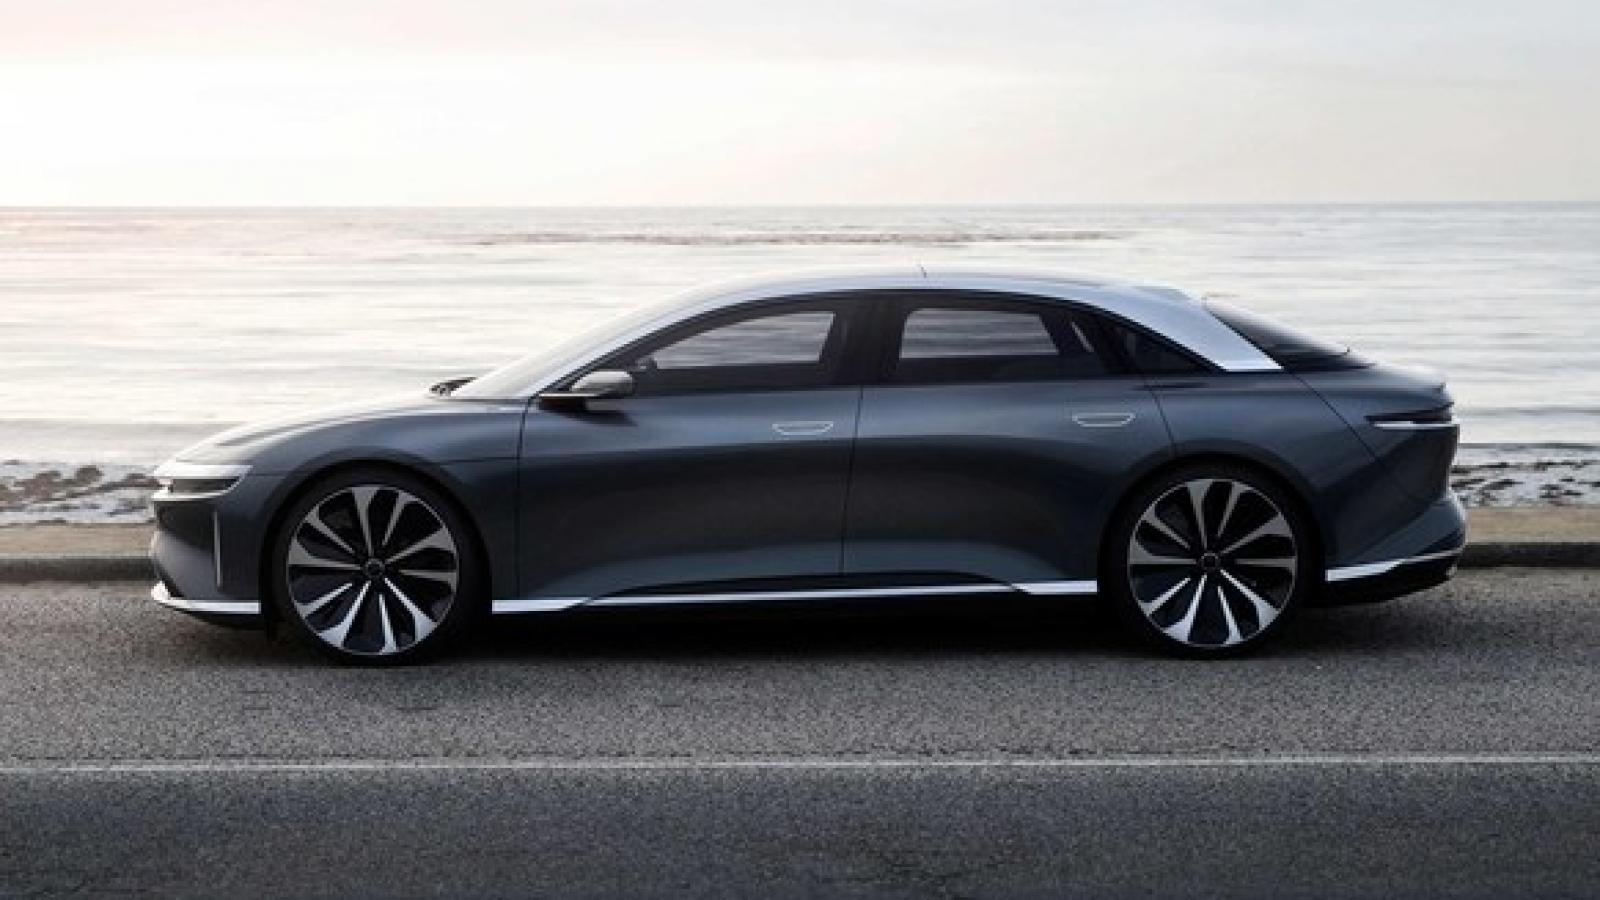 جدیدترین تسلا چالنجر - اجاره خودرو - اجاره ماشین